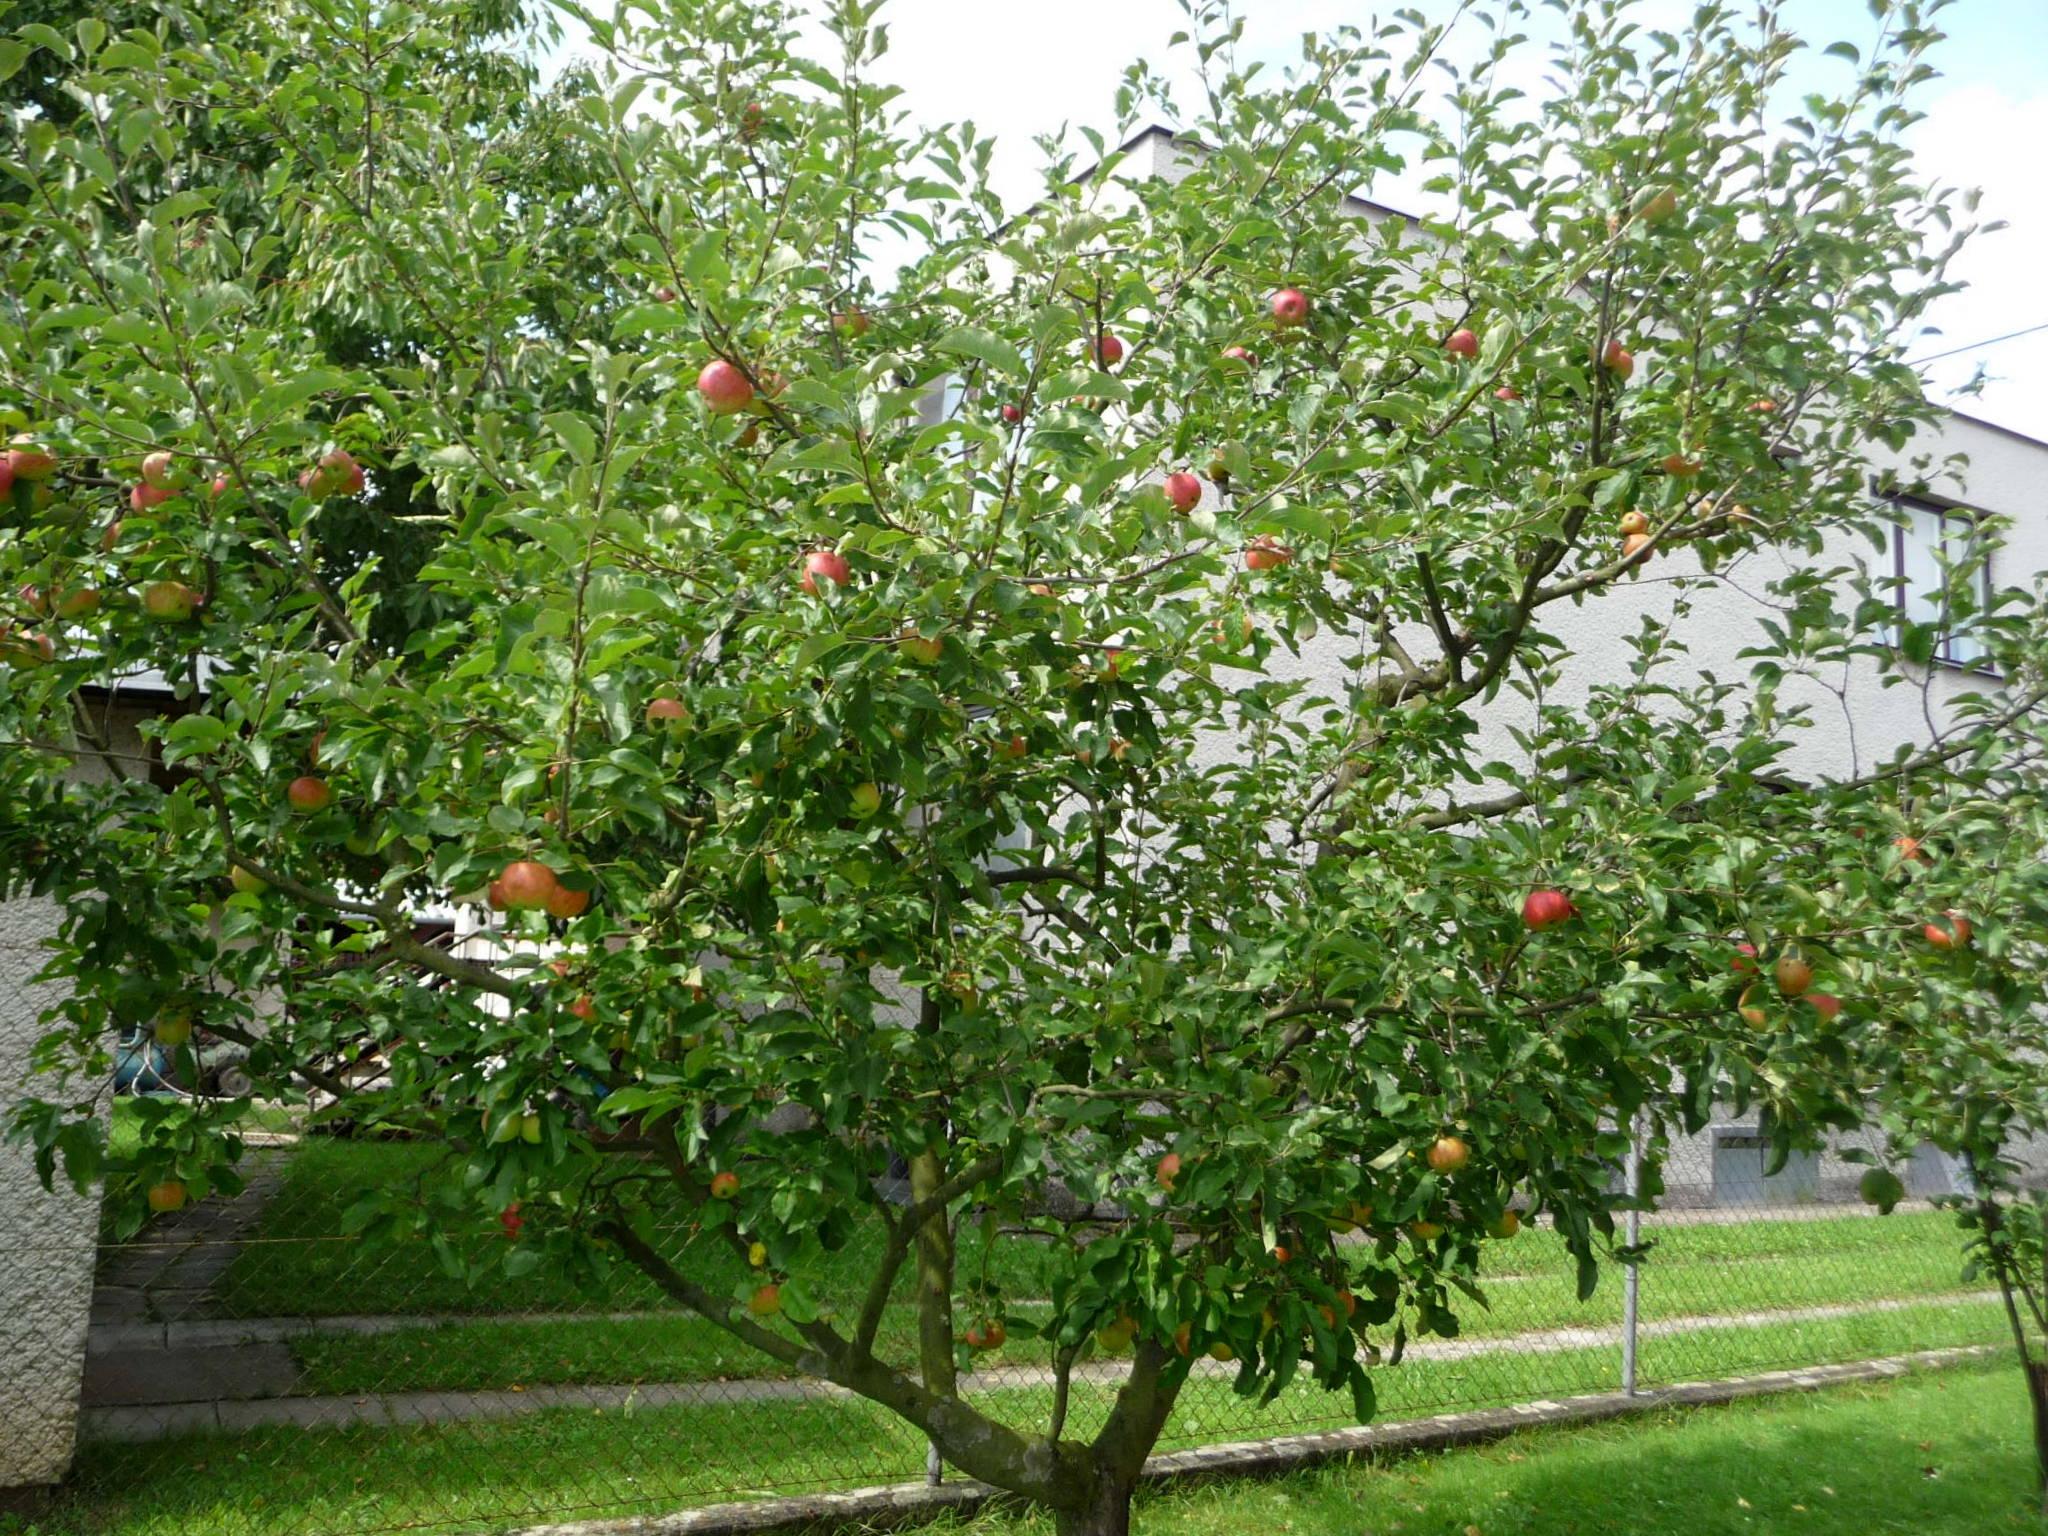 Iphone: Apple Trees